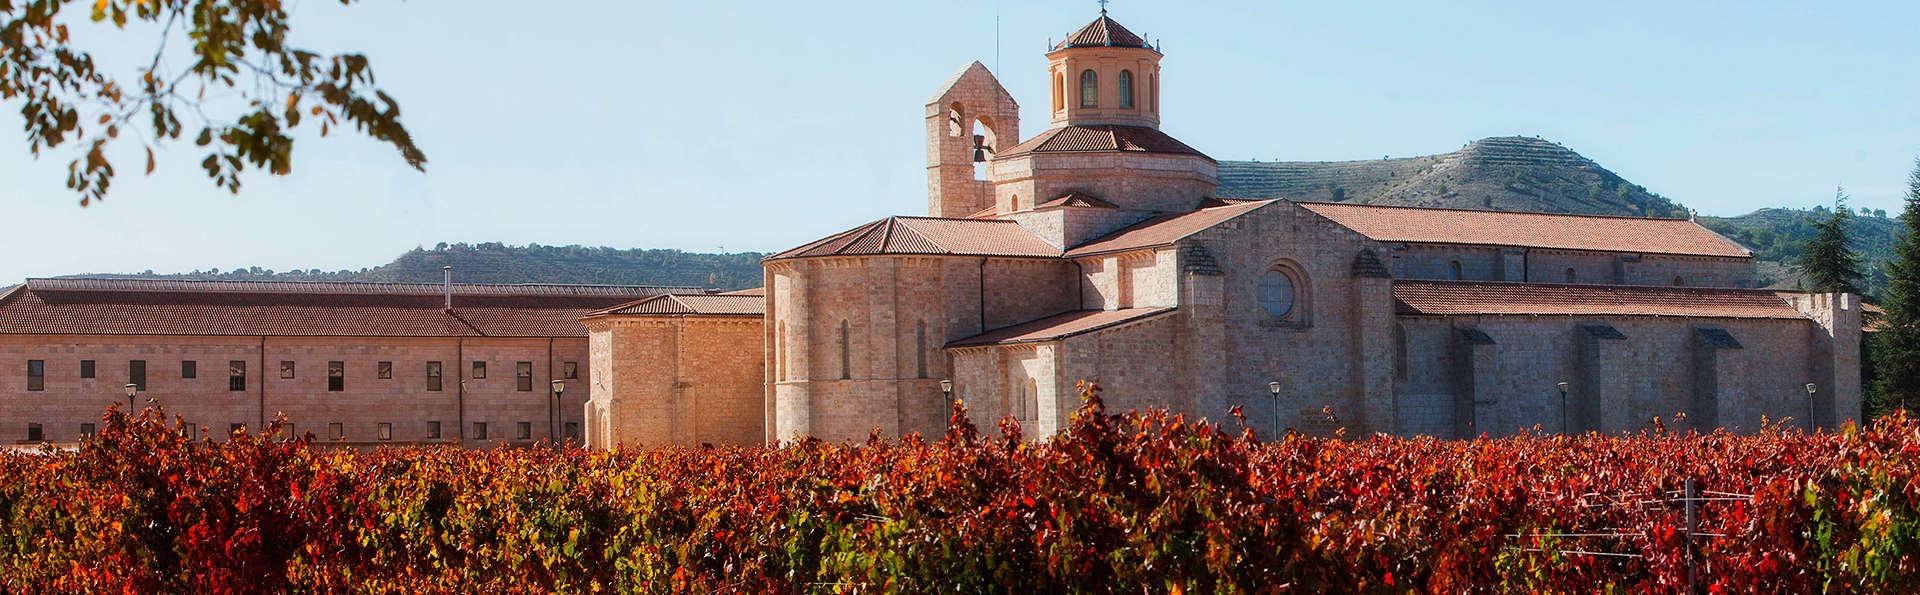 Week-end de luxe dans la province de Valladolid